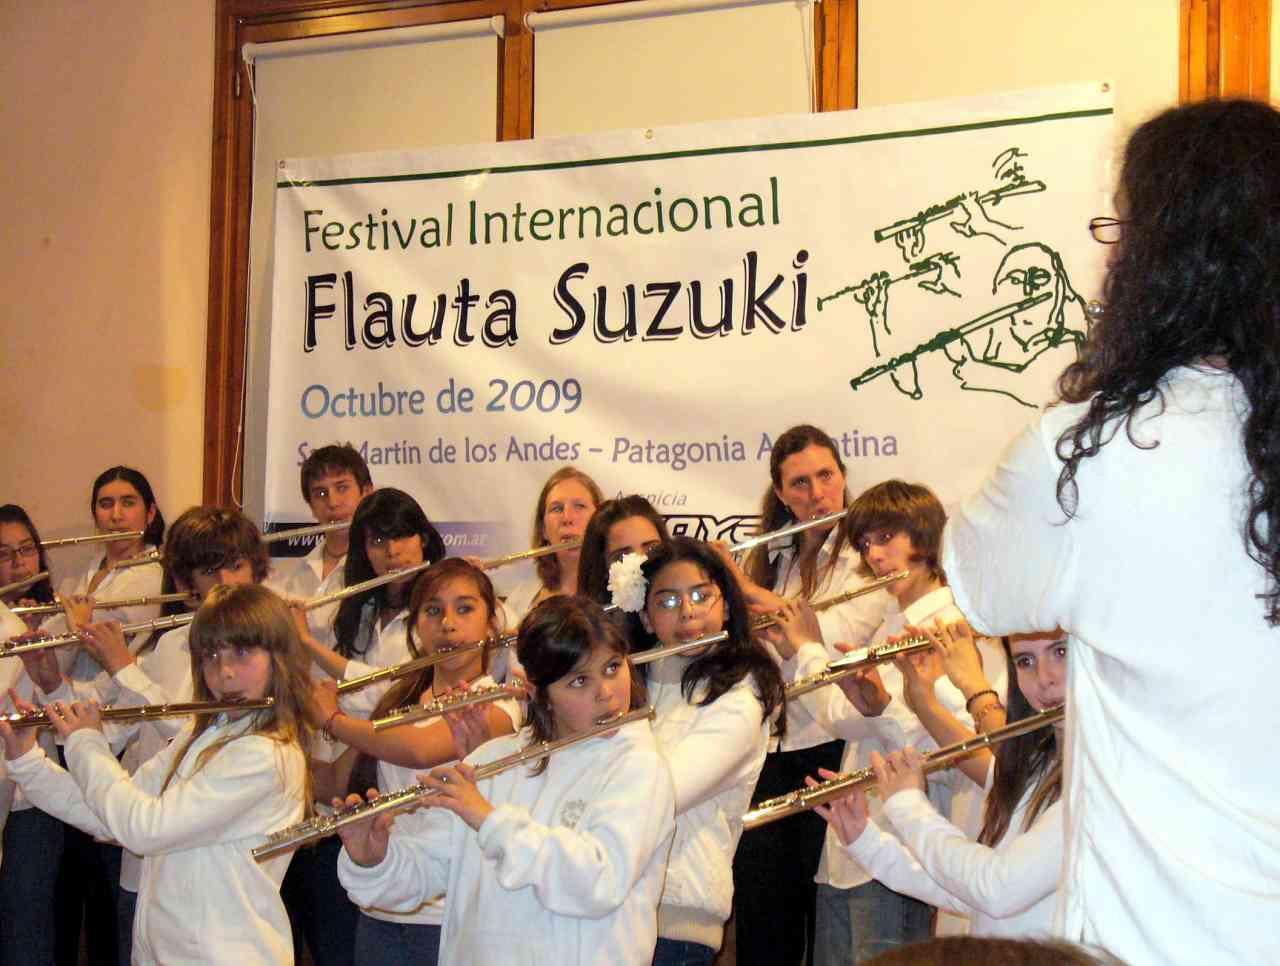 Flute student choir conducted by Fernando Formigo